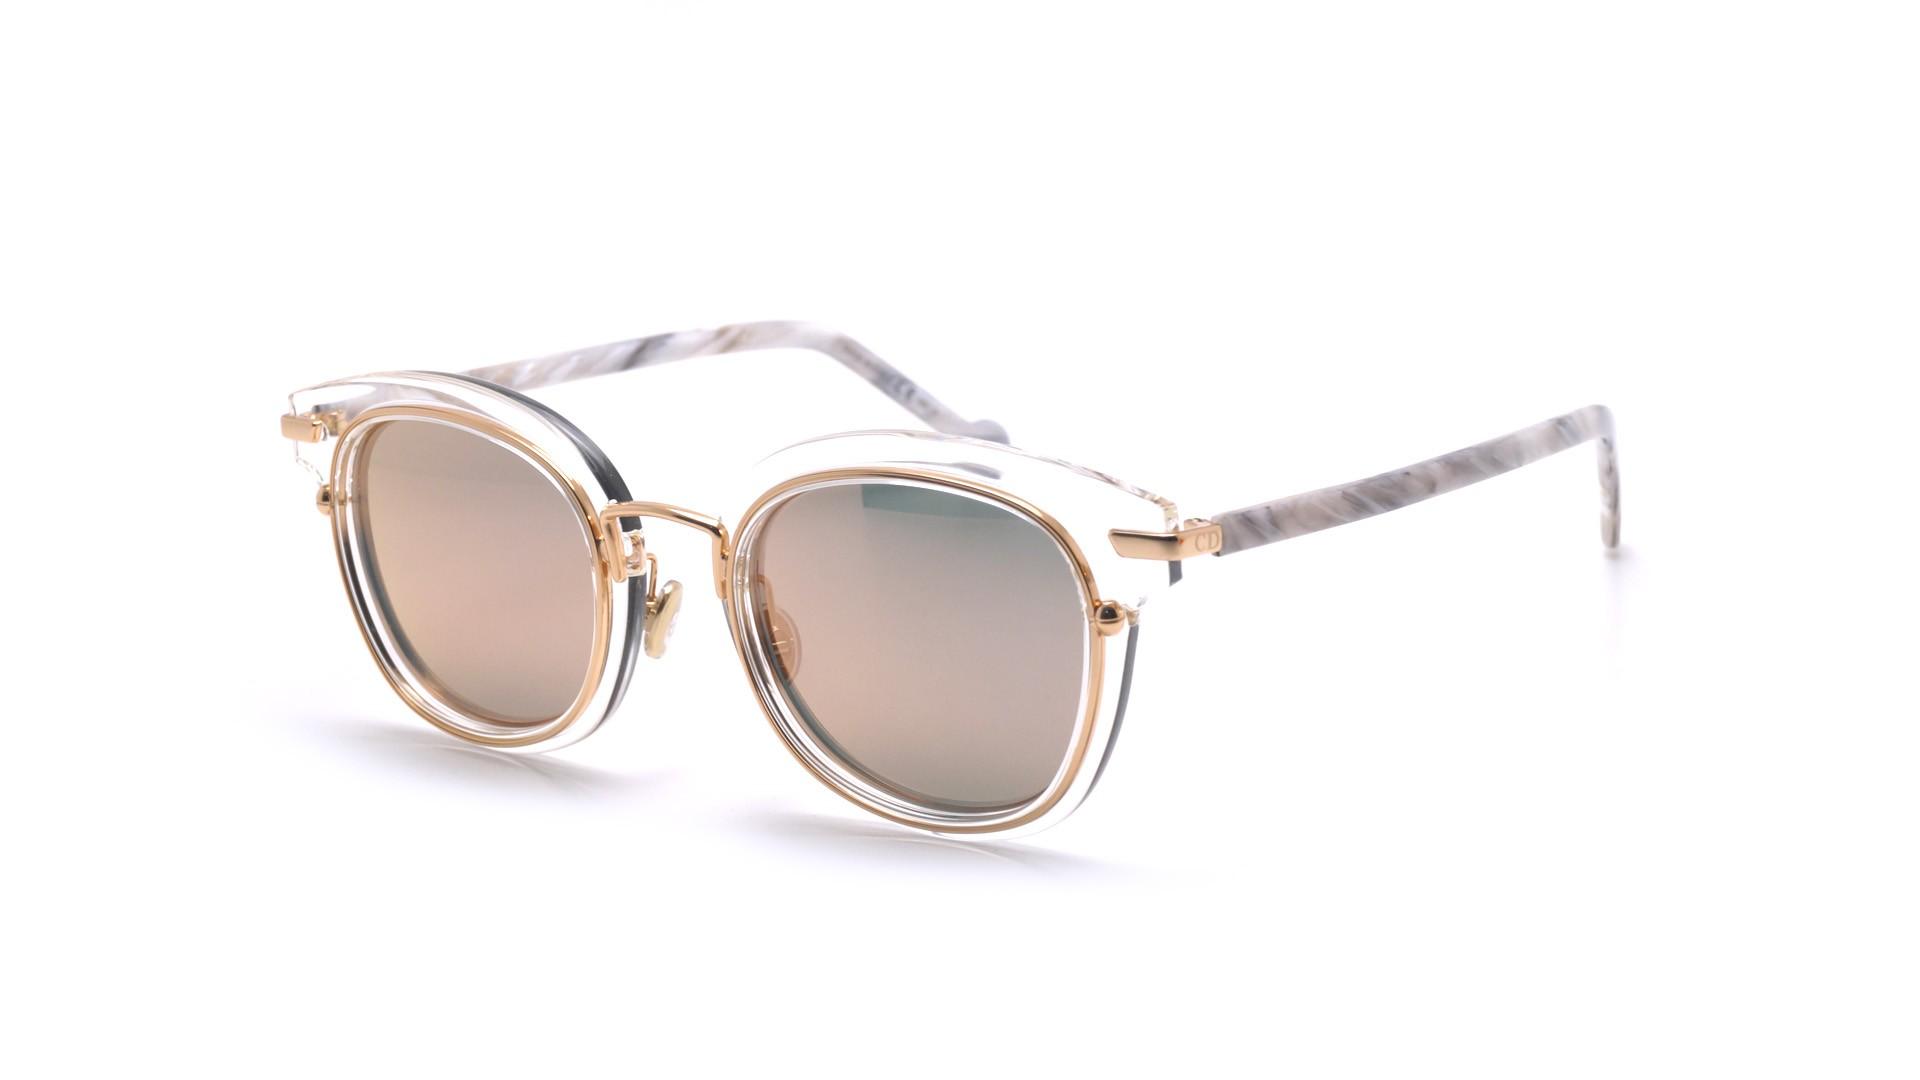 82e3d605b5 Sunglasses Dior Origins 2 Clear DIORORIGINS2 9000J 48-23 Medium Mirror